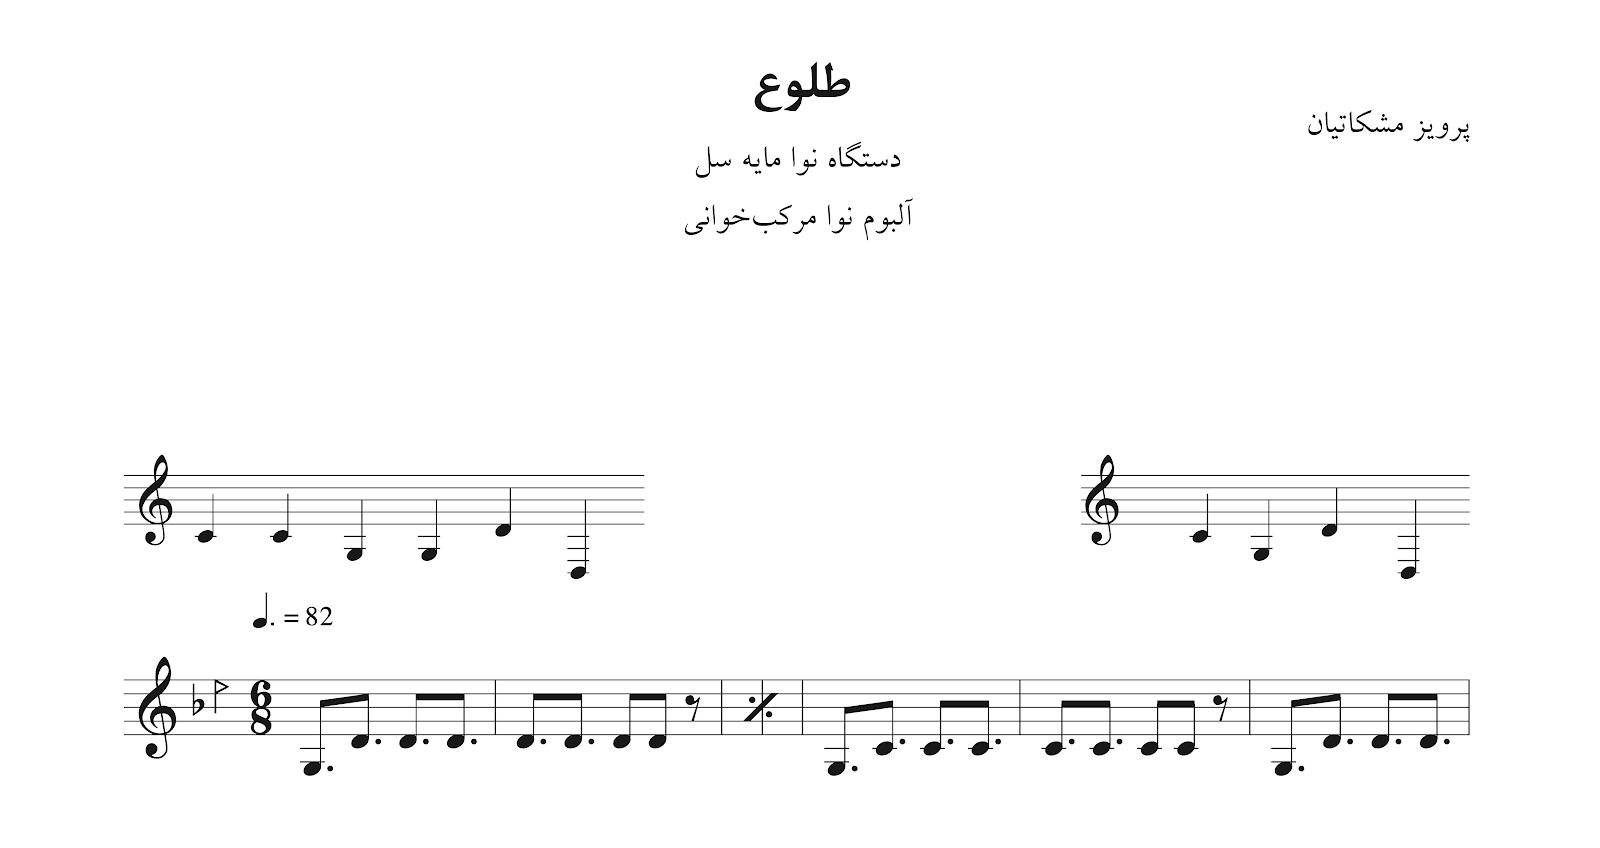 نت طلوع پرویز مشکاتیان